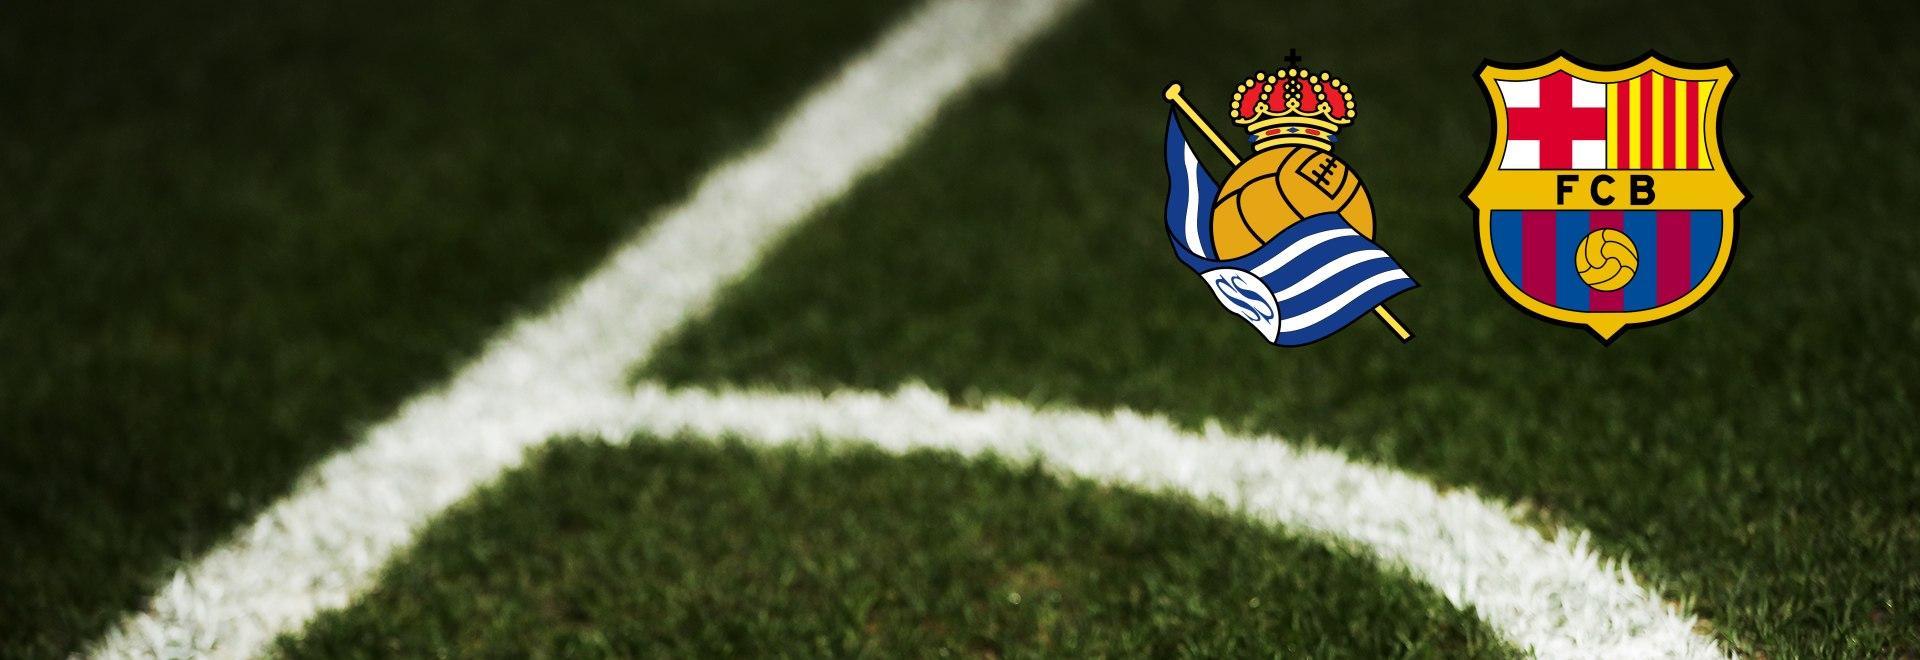 Real Sociedad - Barcellona. 28a g.